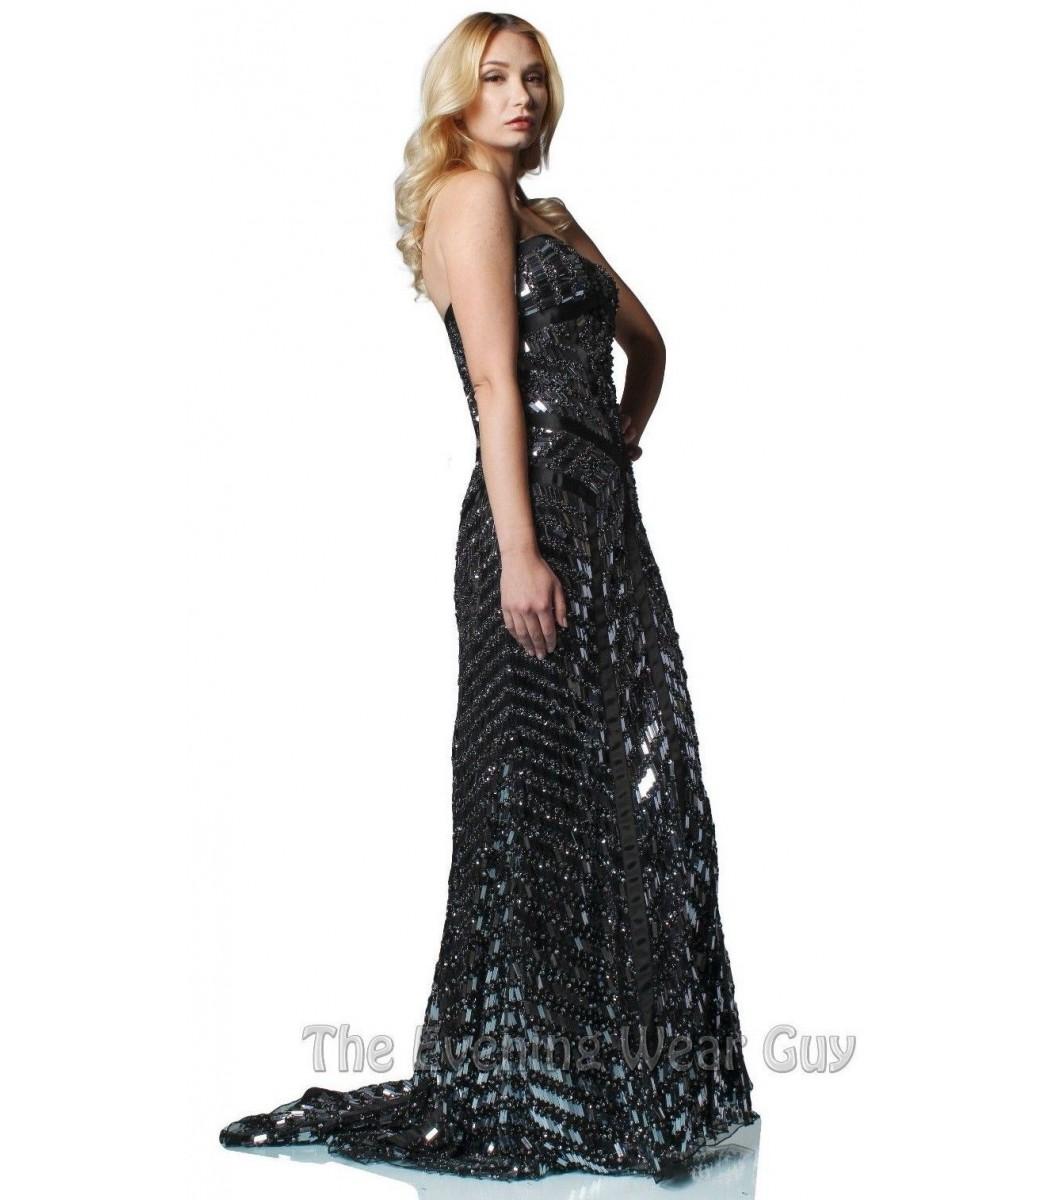 Sherri Hill 2813 Black/Gunmetal Evening Gown Dress Size 10 NWT ...